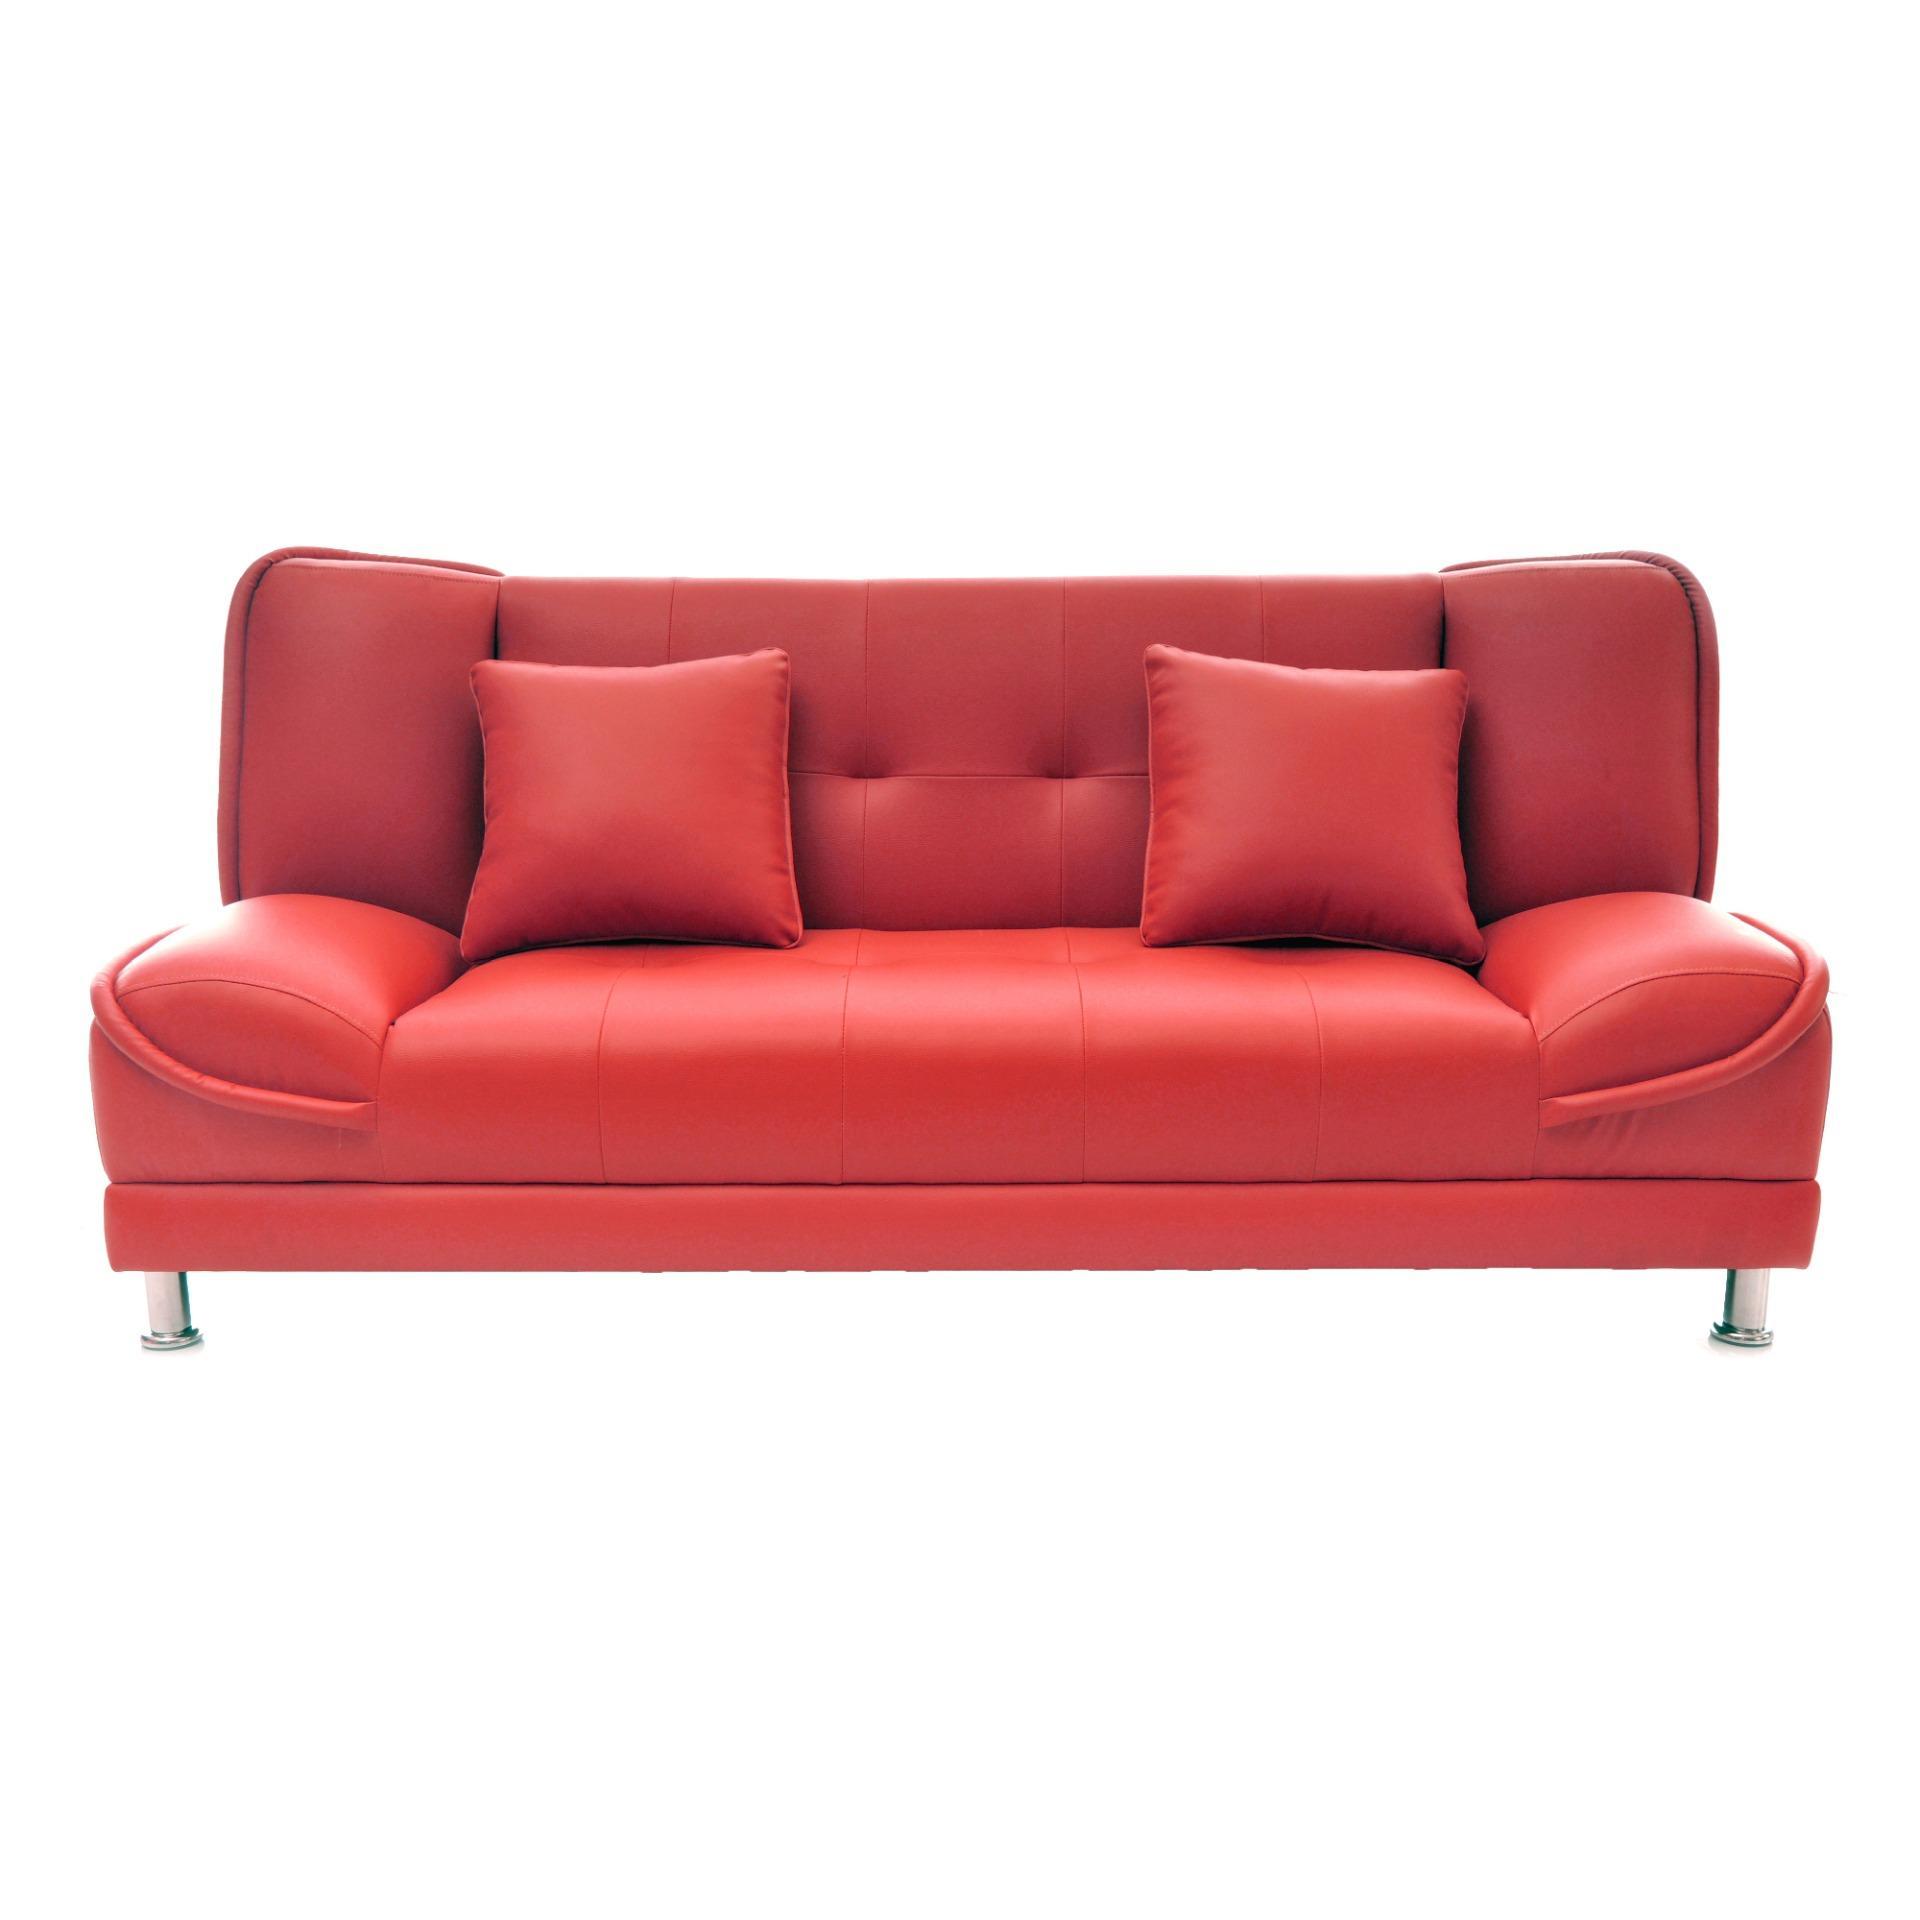 sofa bed. sofa bed